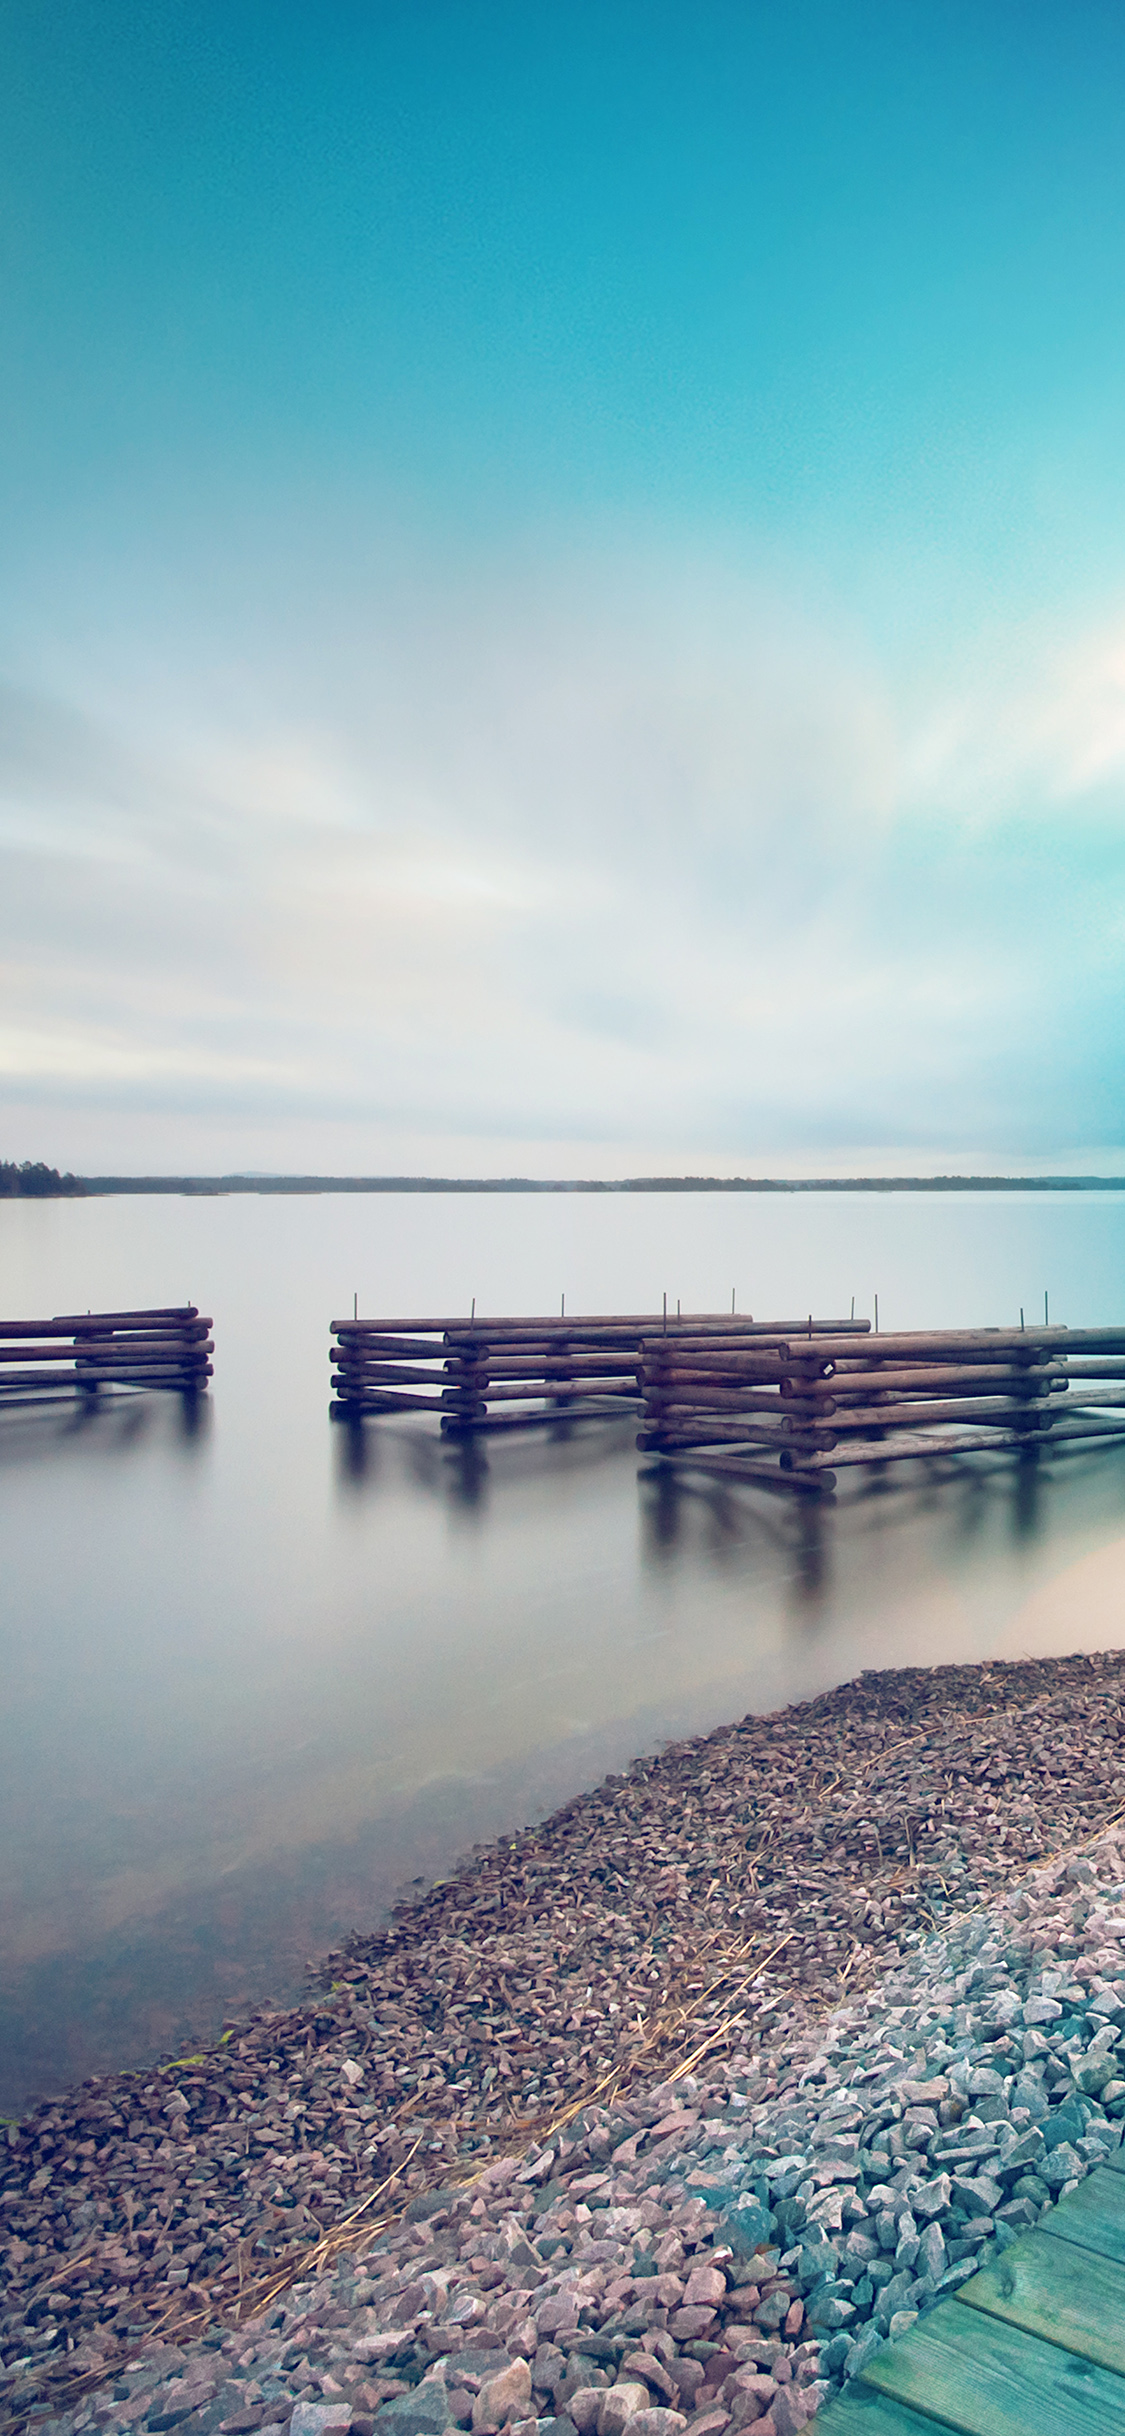 Lake Calm Beautiful Sea Water Blue Flare Iphone X Wallpapers Free